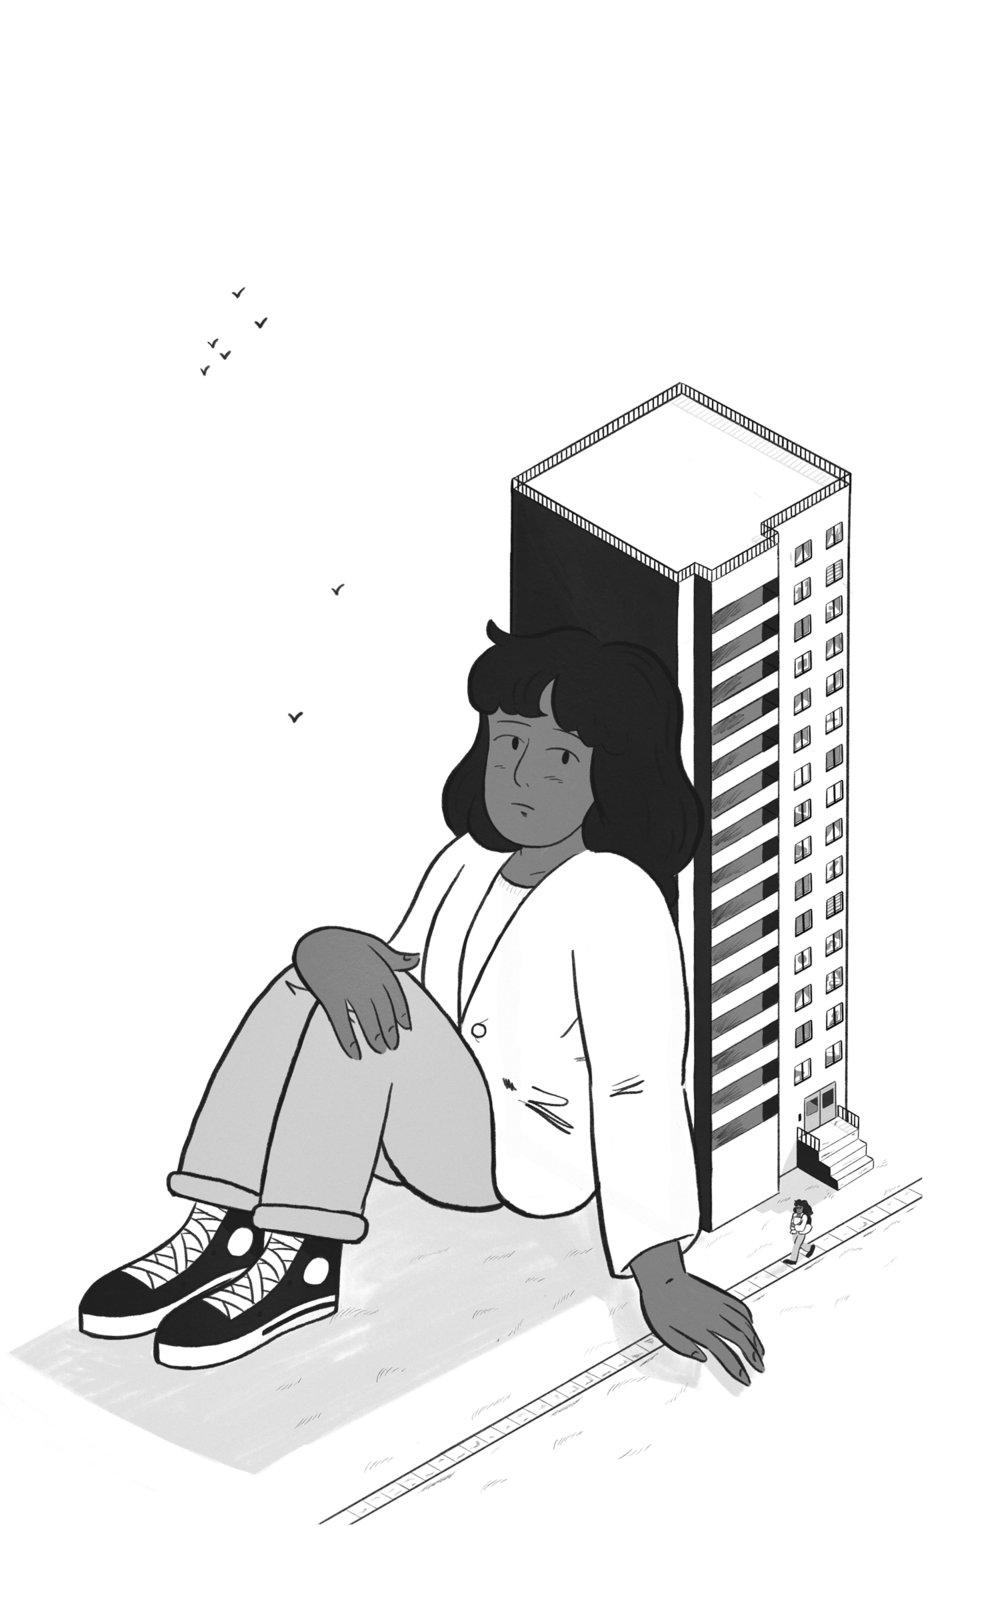 'Parc-Ex' (a short story by M Malik), 2018.